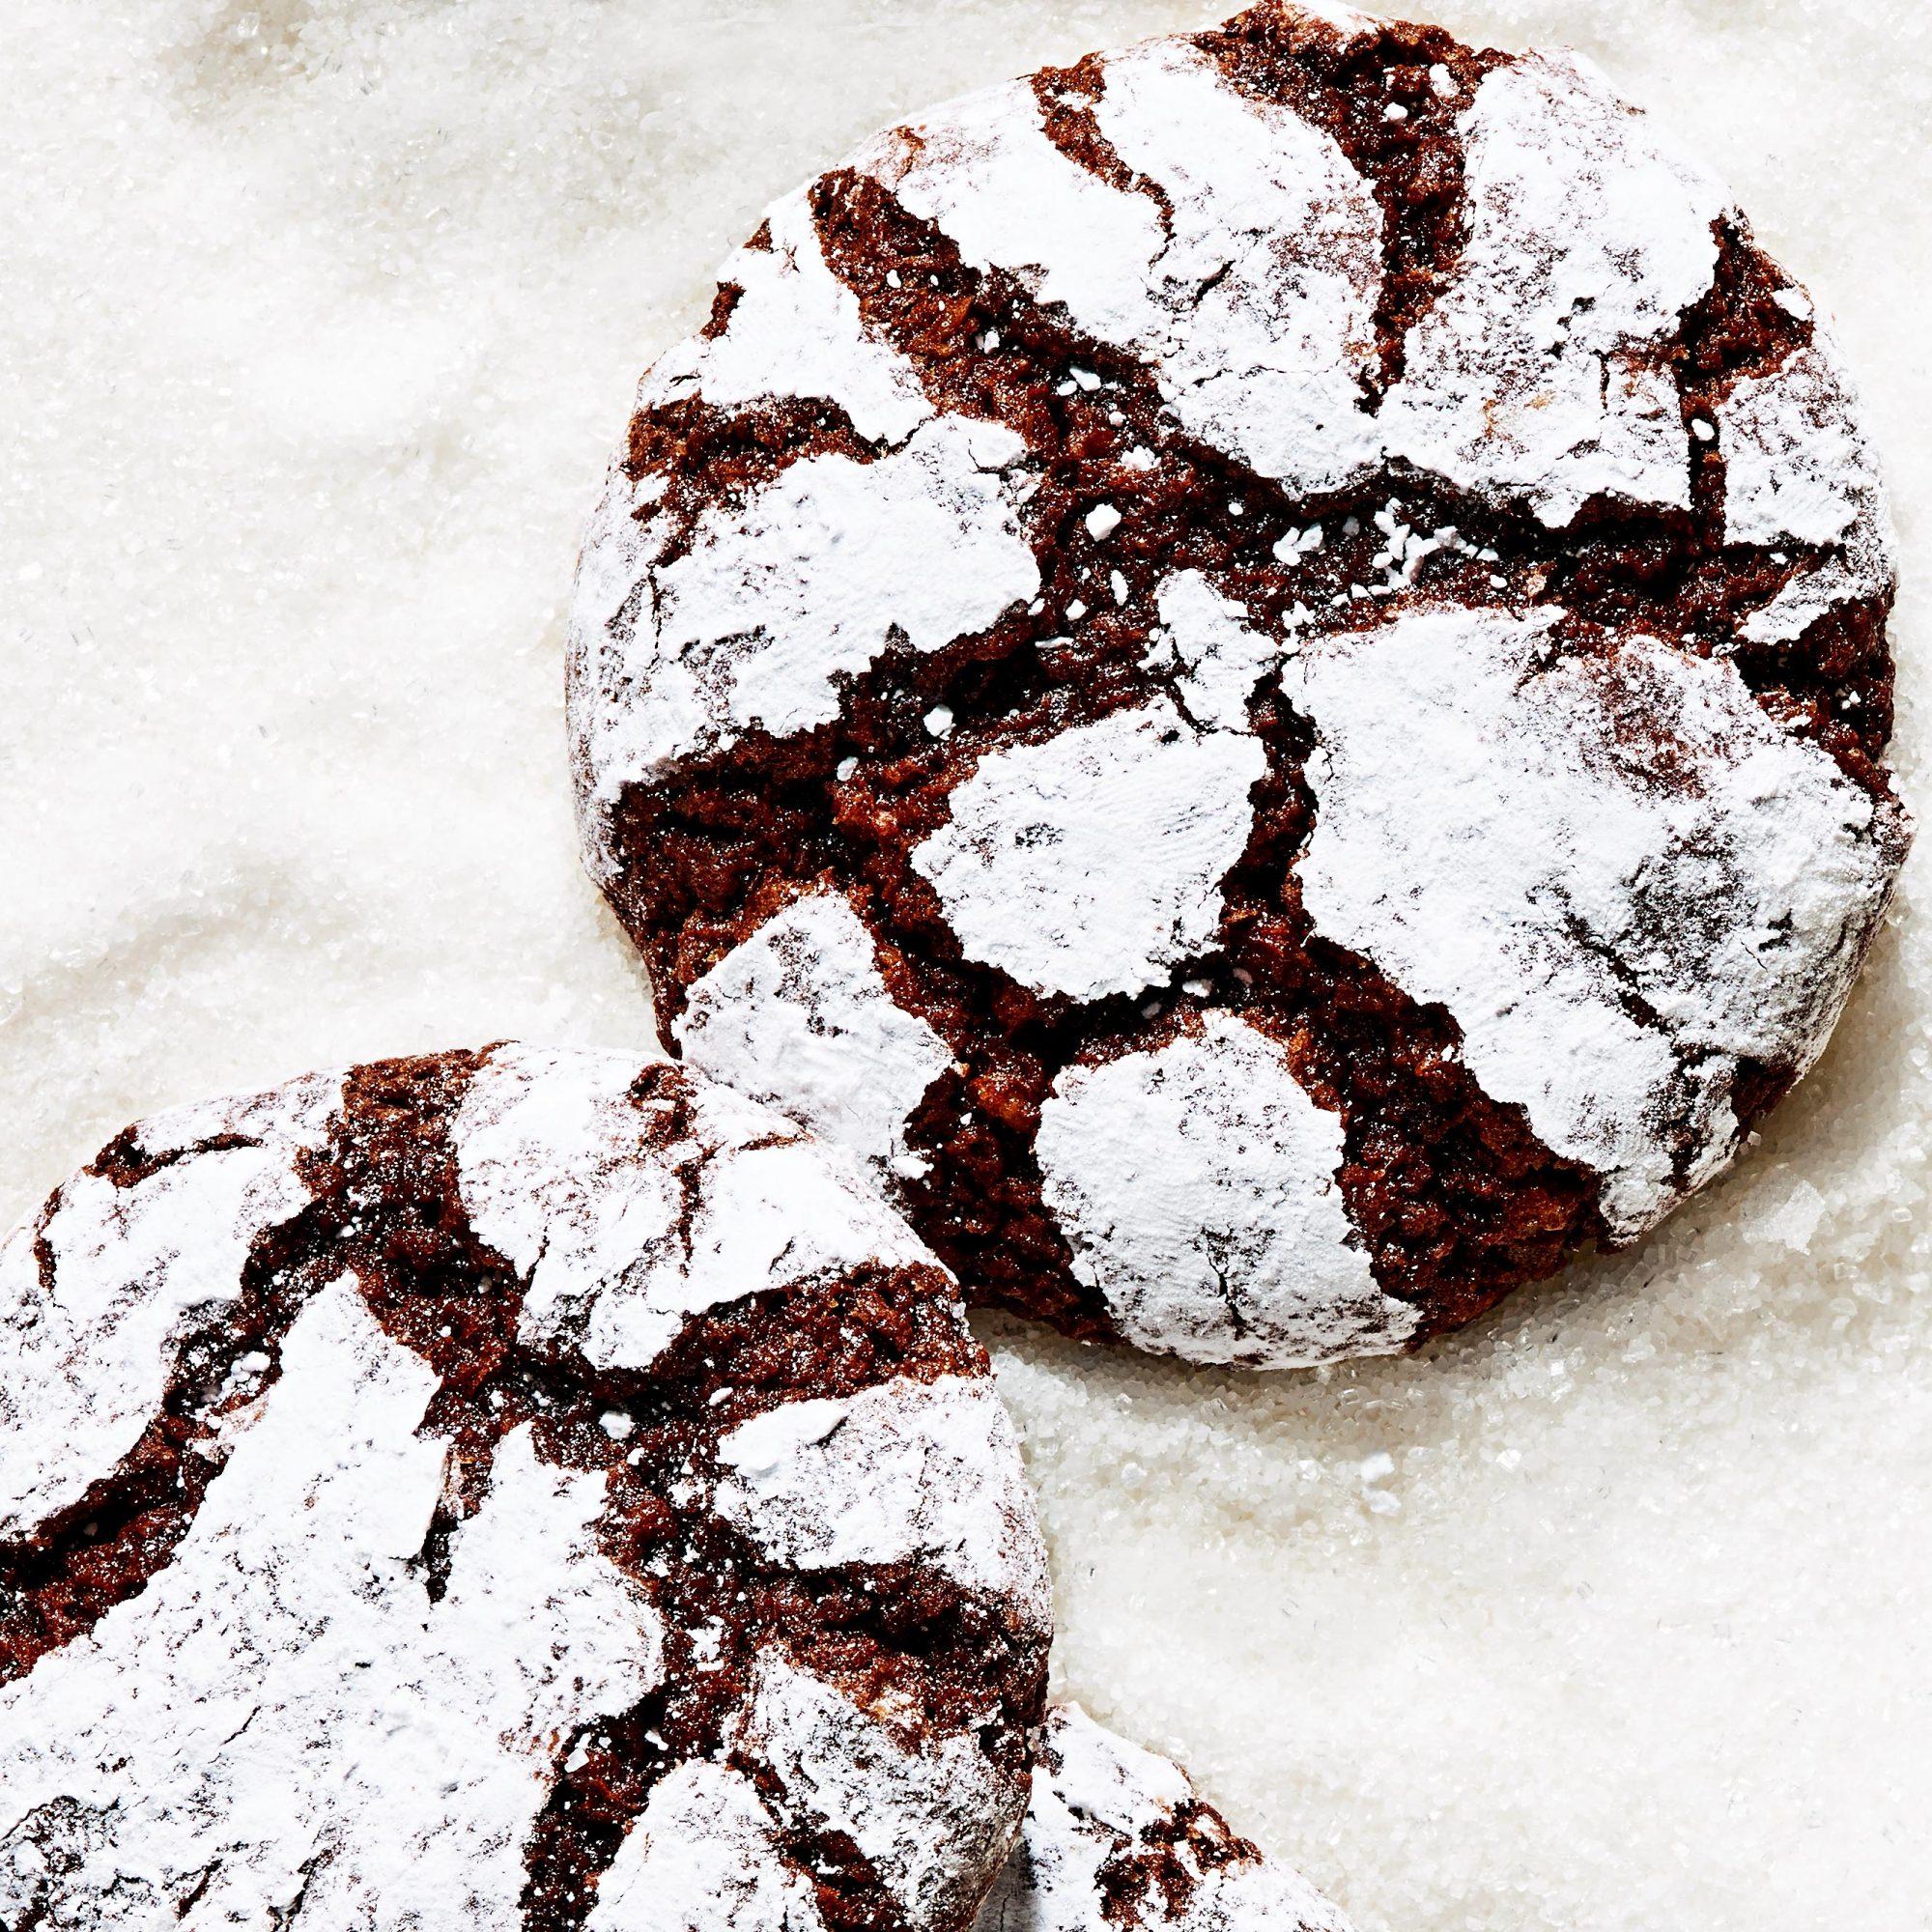 Chocolate-Walnut Crinkles